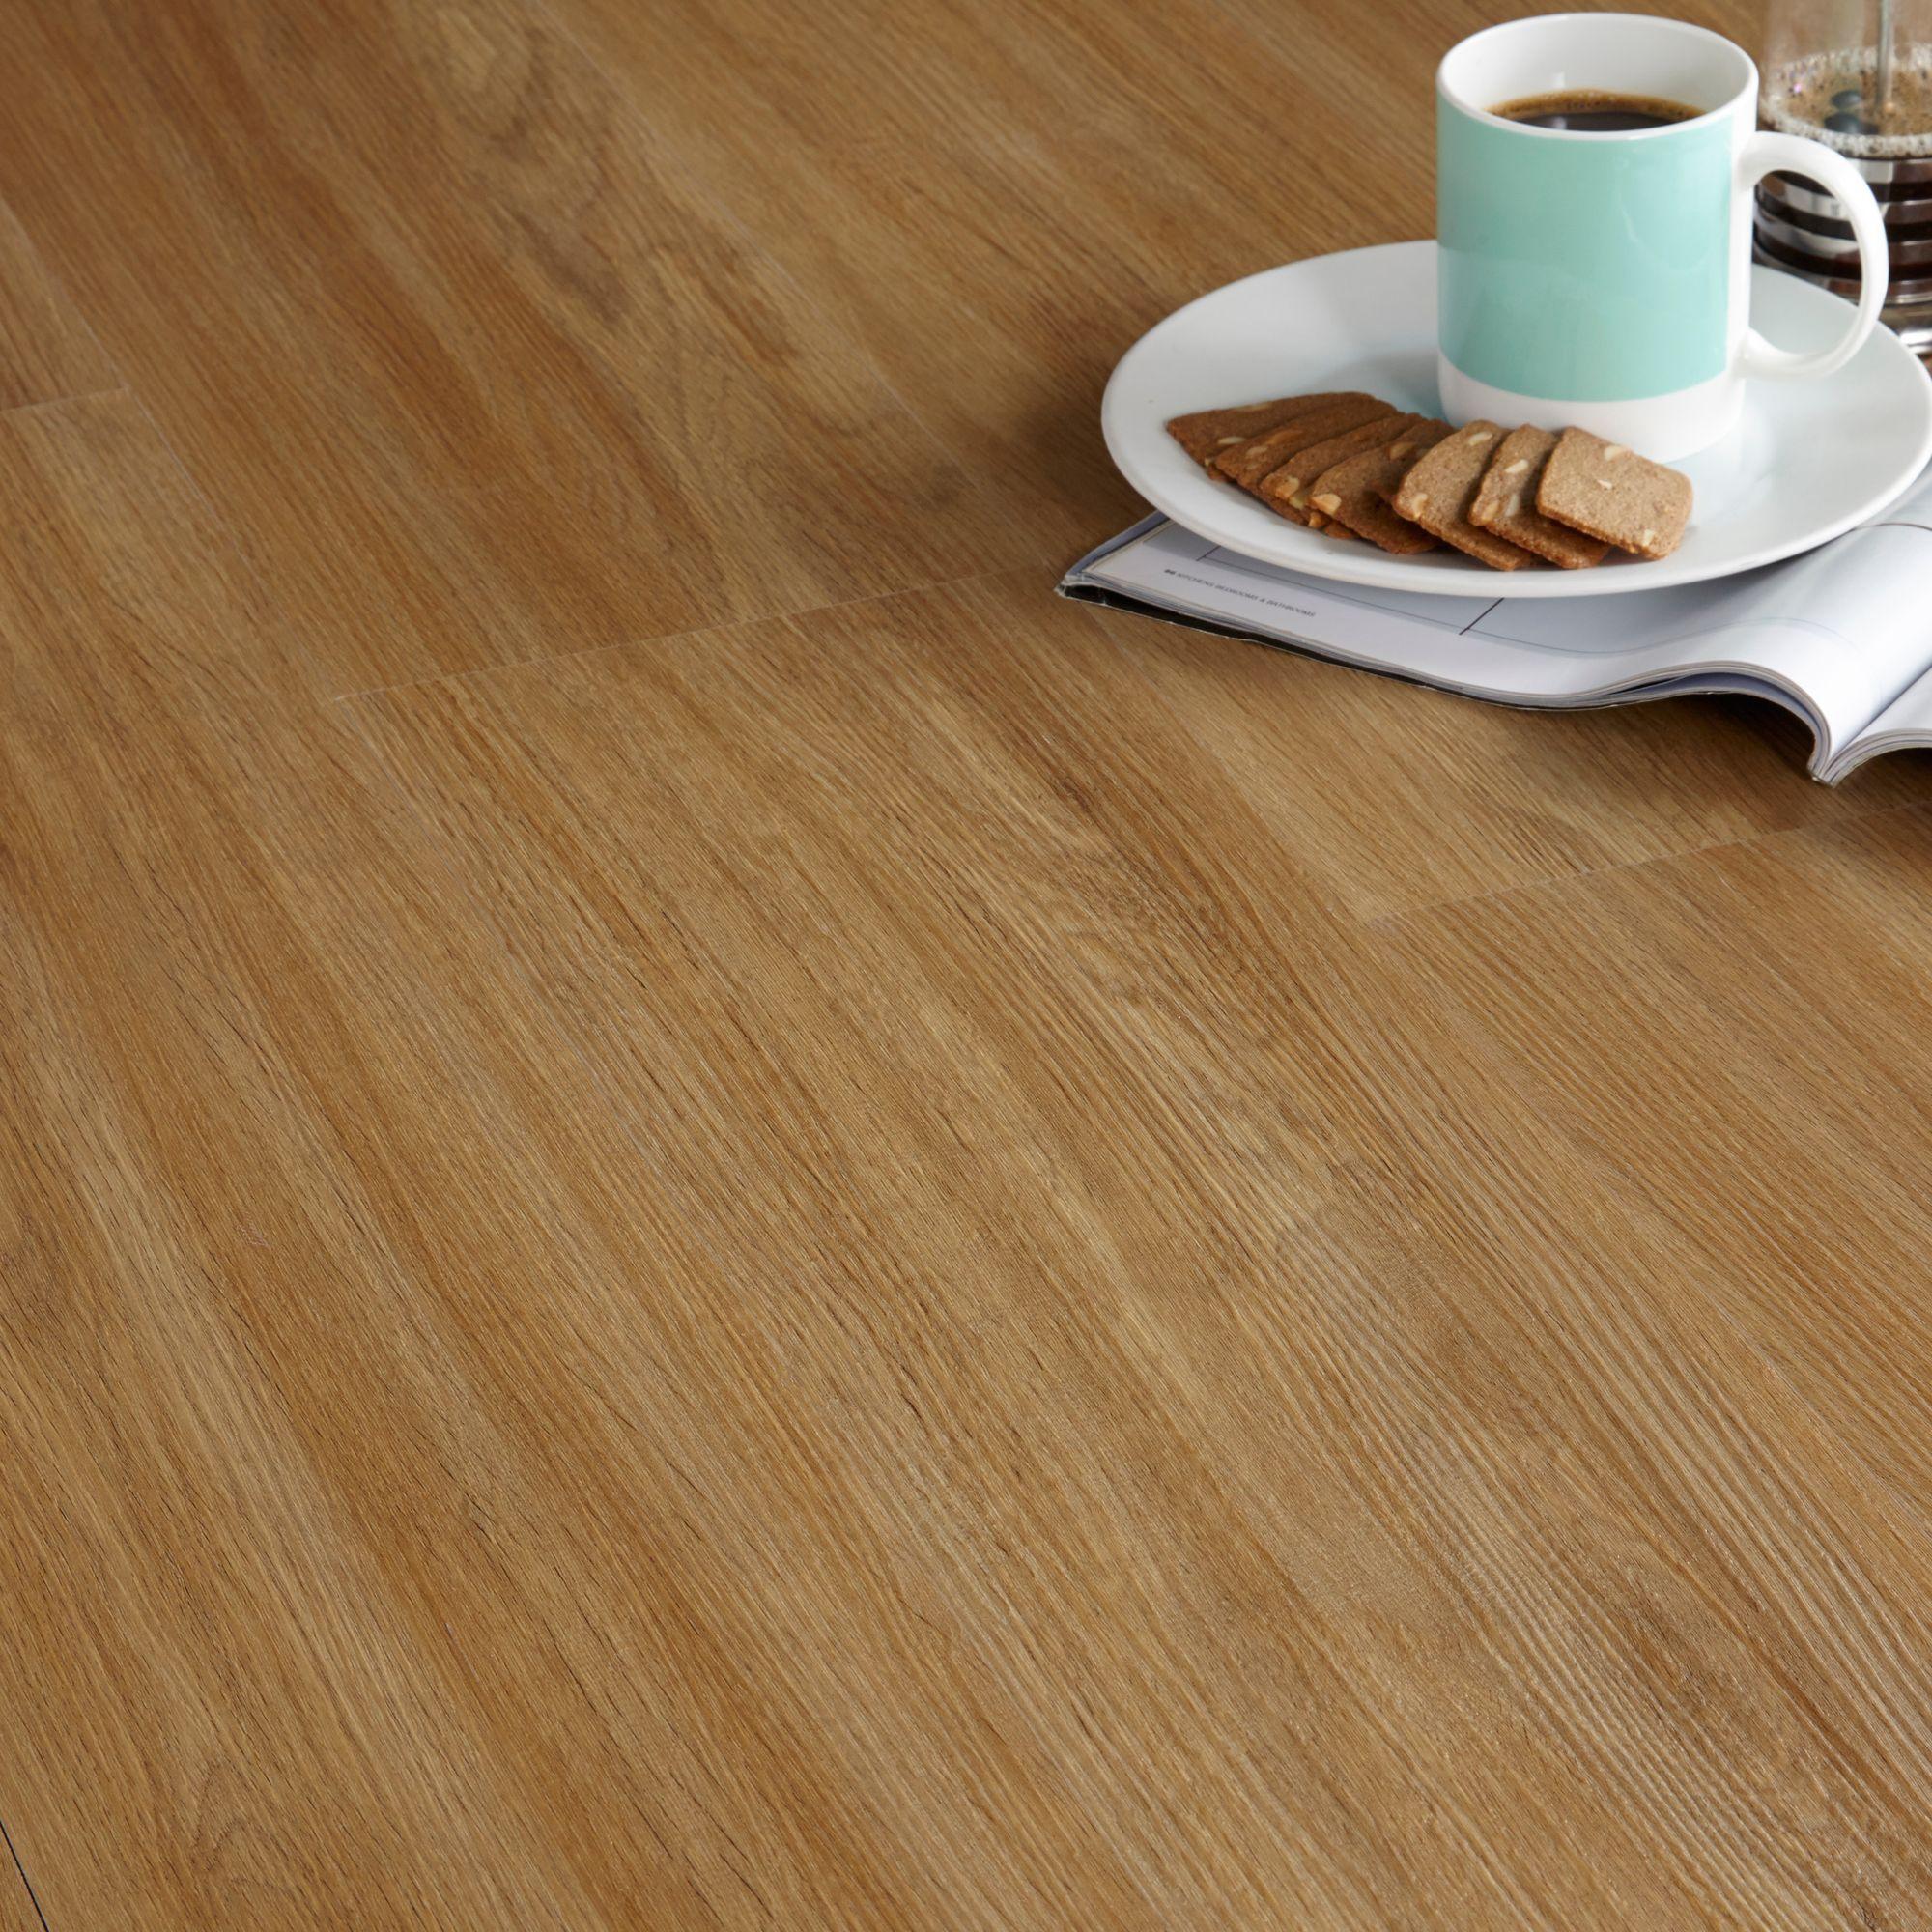 Colours brown warm oak effect luxury vinyl click flooring 176 m colours brown warm oak effect luxury vinyl click flooring 176 m pack departments diy at bq dailygadgetfo Choice Image